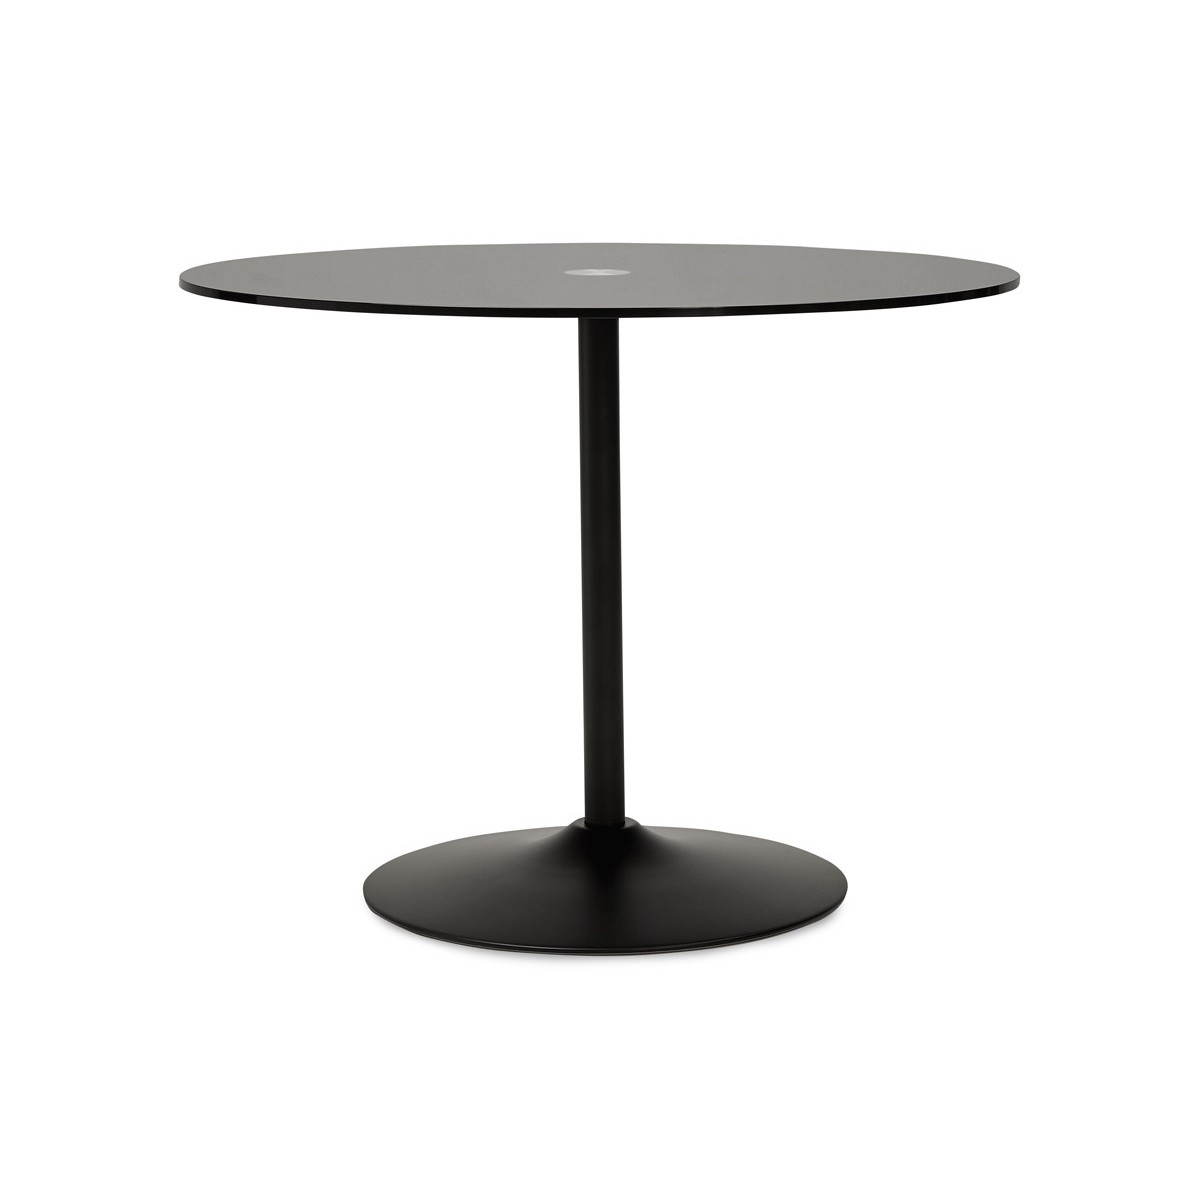 Design Roundtable Milan Glass And Metal O 100 Cm Black